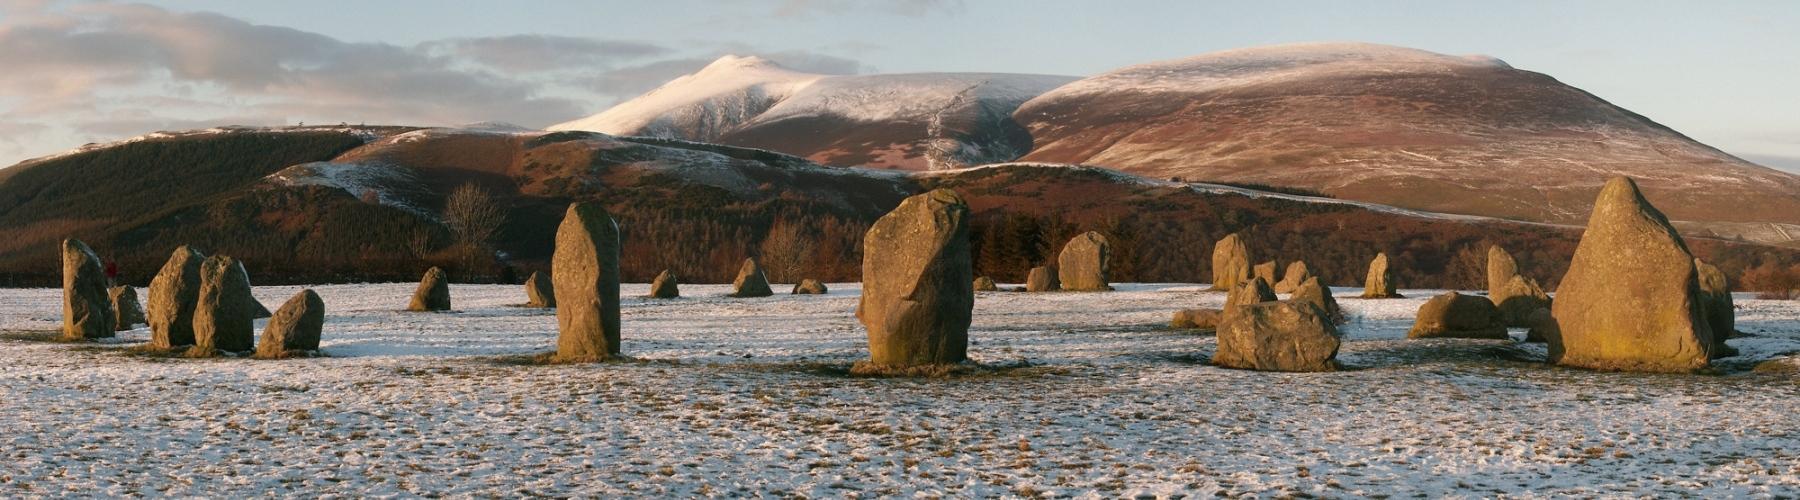 P0002-Winter-at-Castlerigg-Stone-Circle